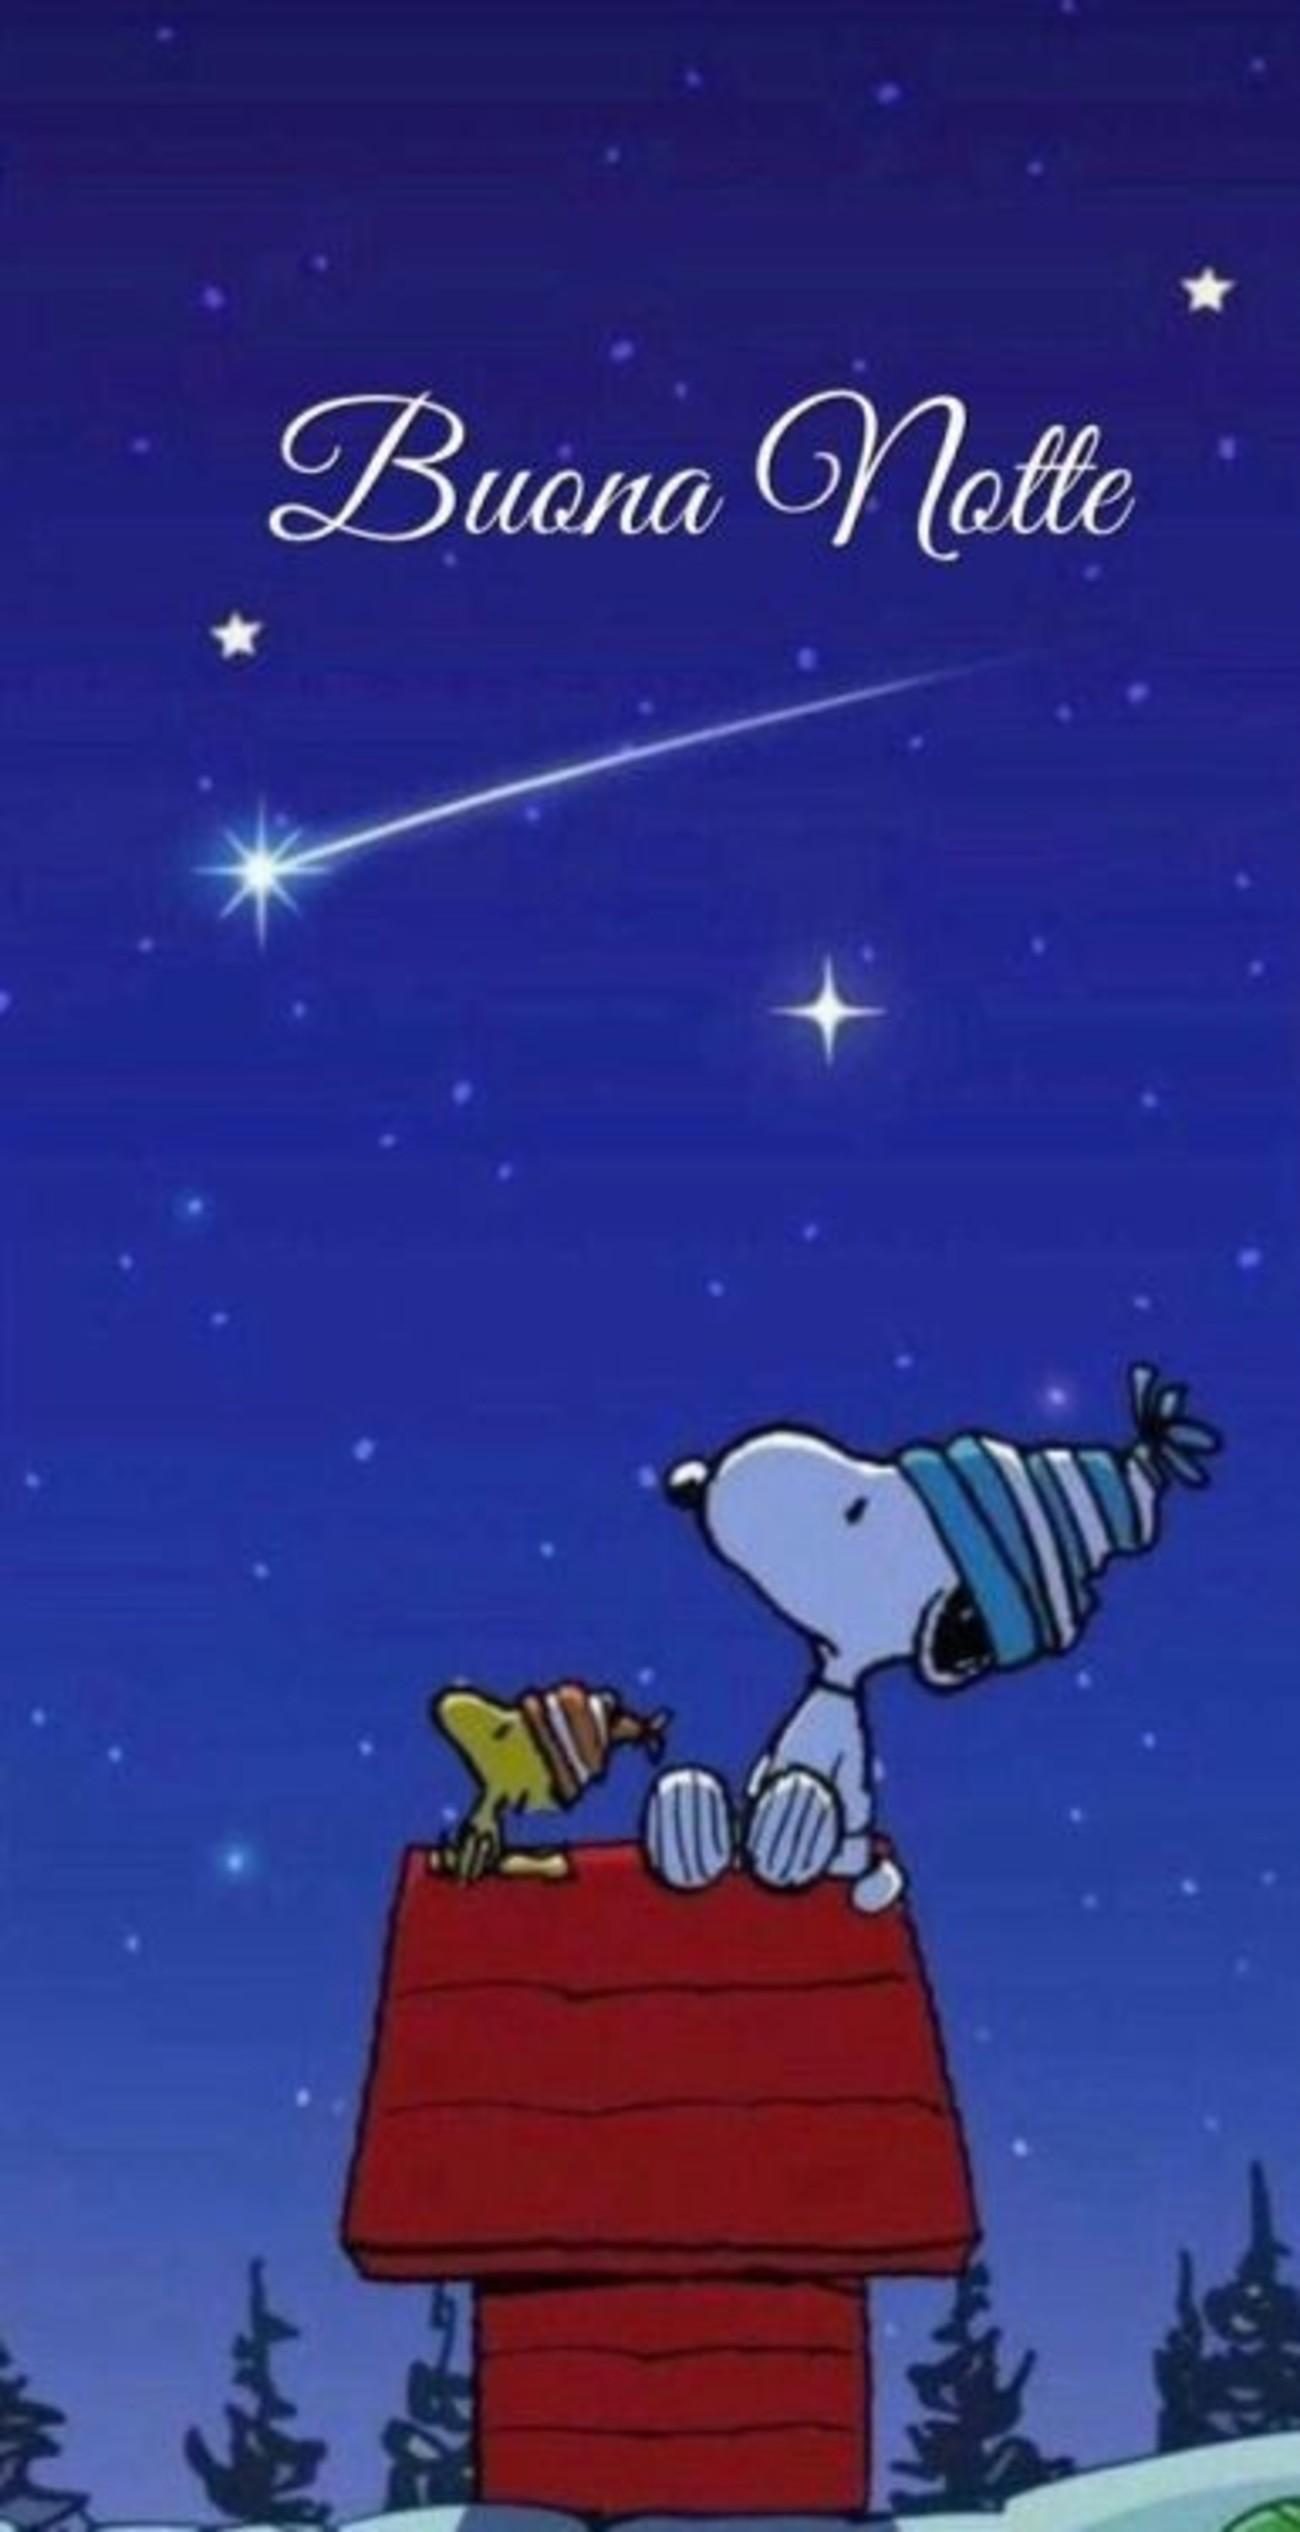 Buonanotte Snoopy Buongiornoate It